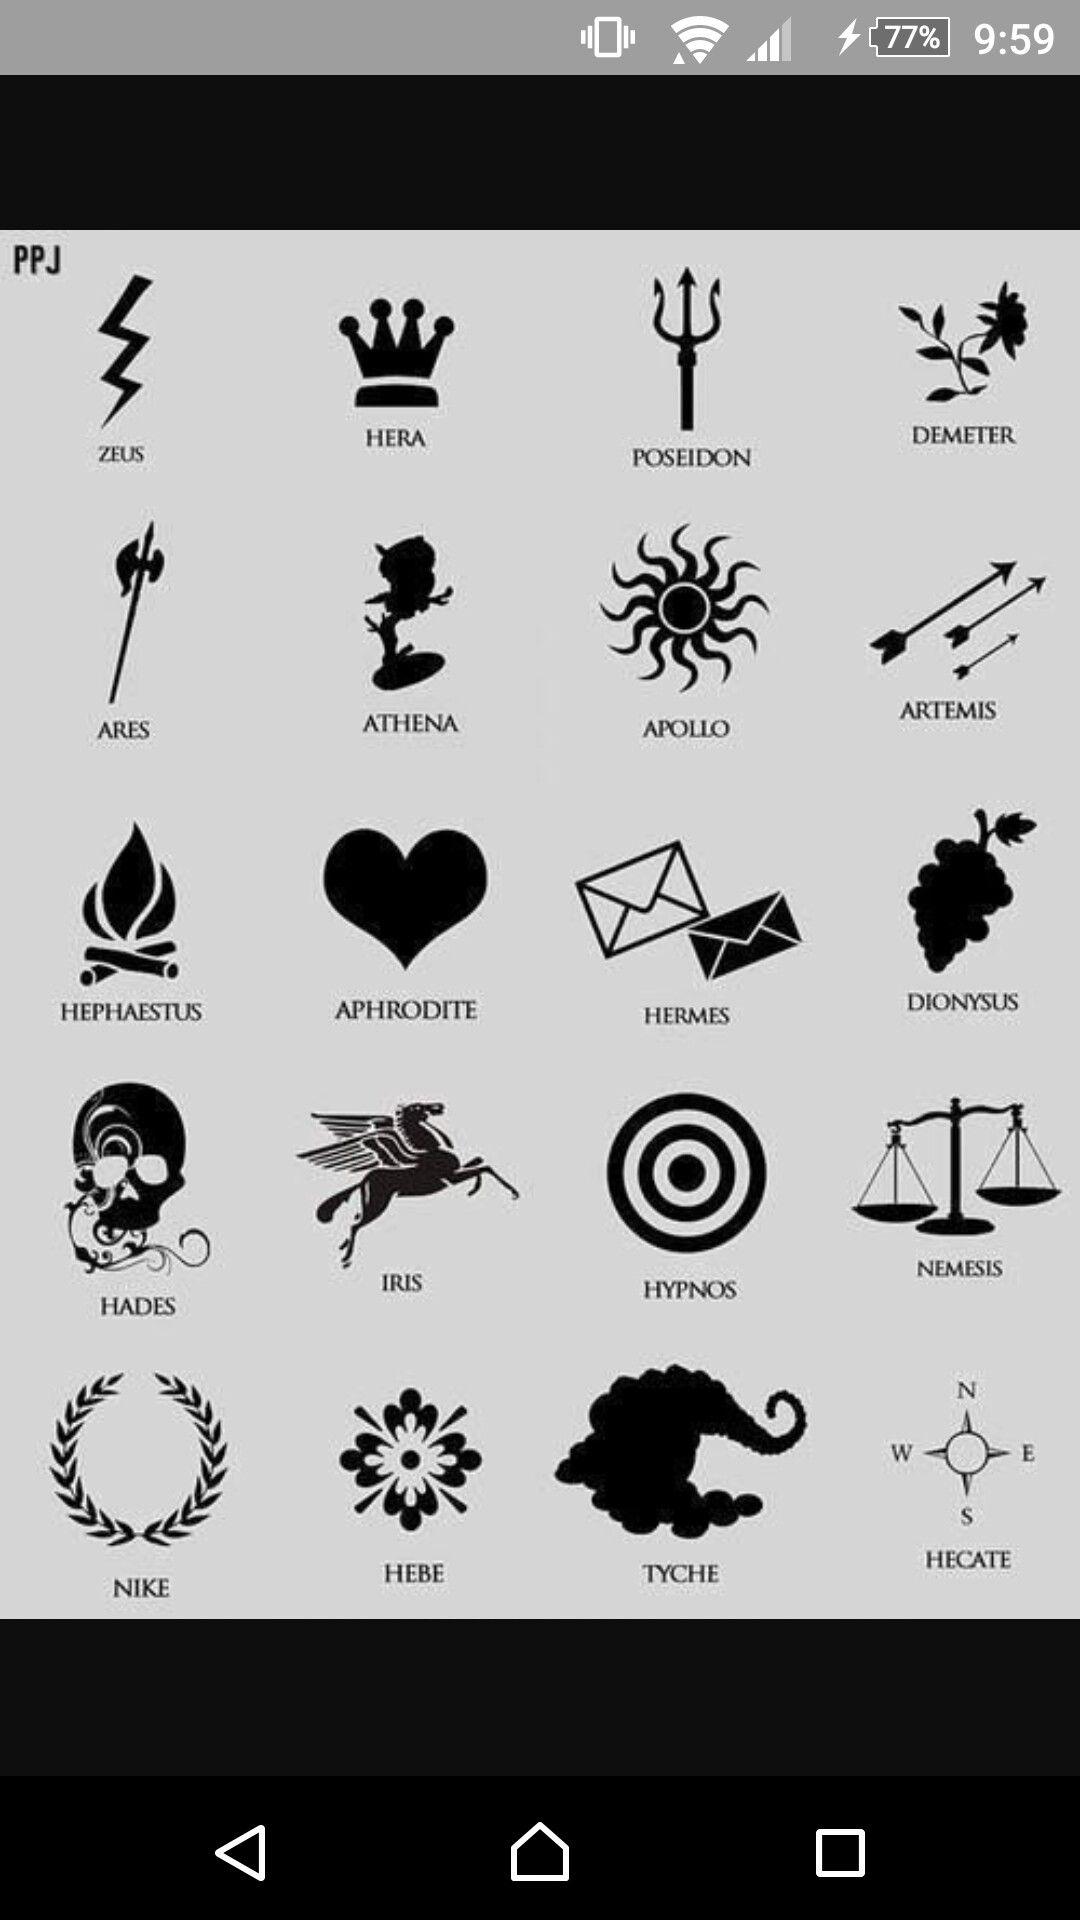 god symbols im probly athena hermes hades or tyche